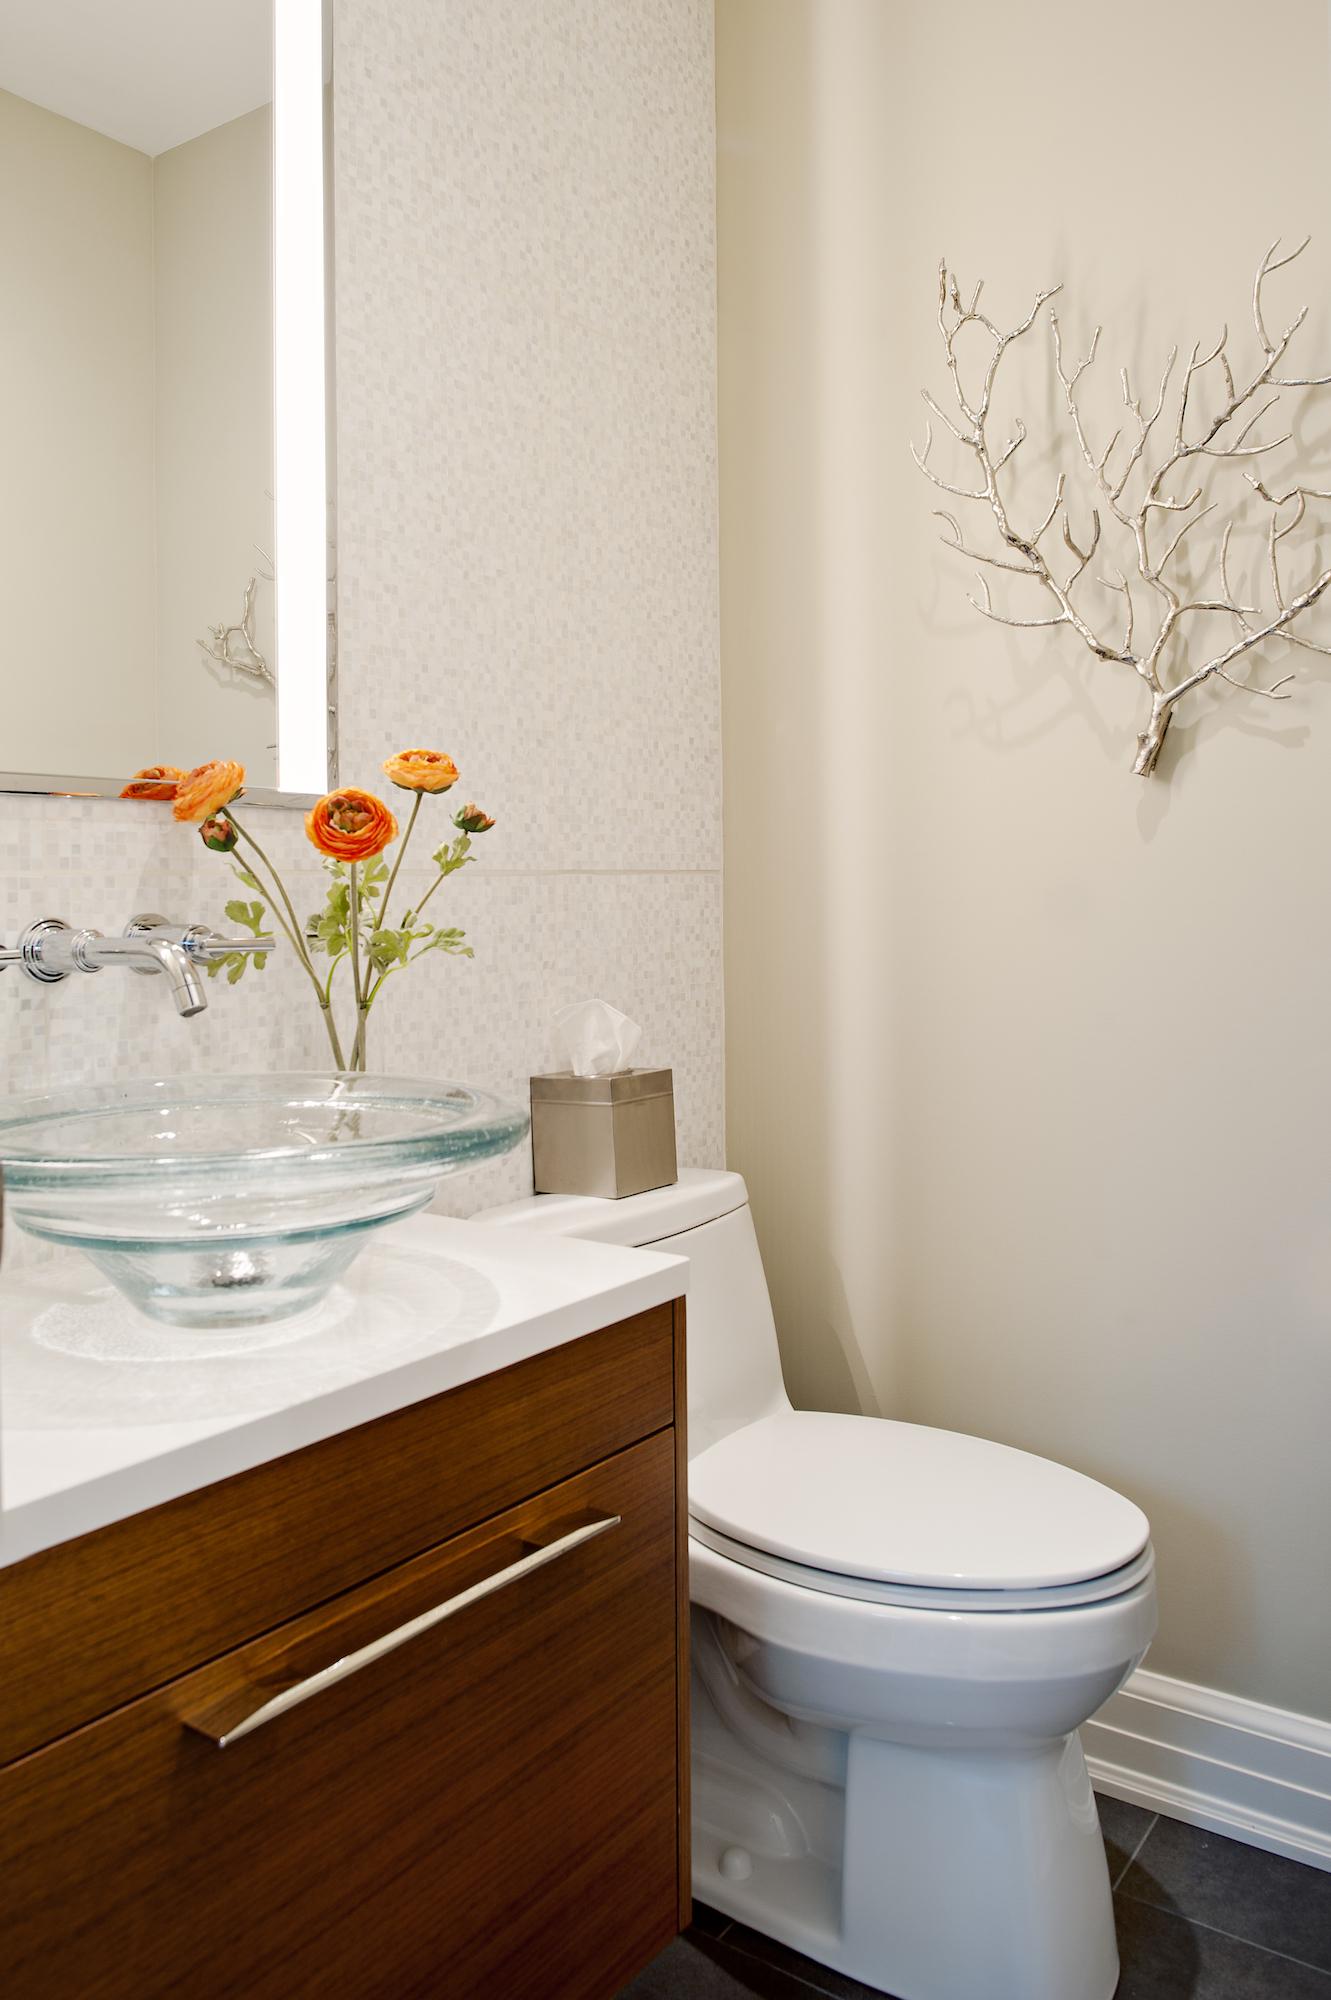 16 Pizzale Design Interior Decorating bathroom Glass bowl sink .jpg